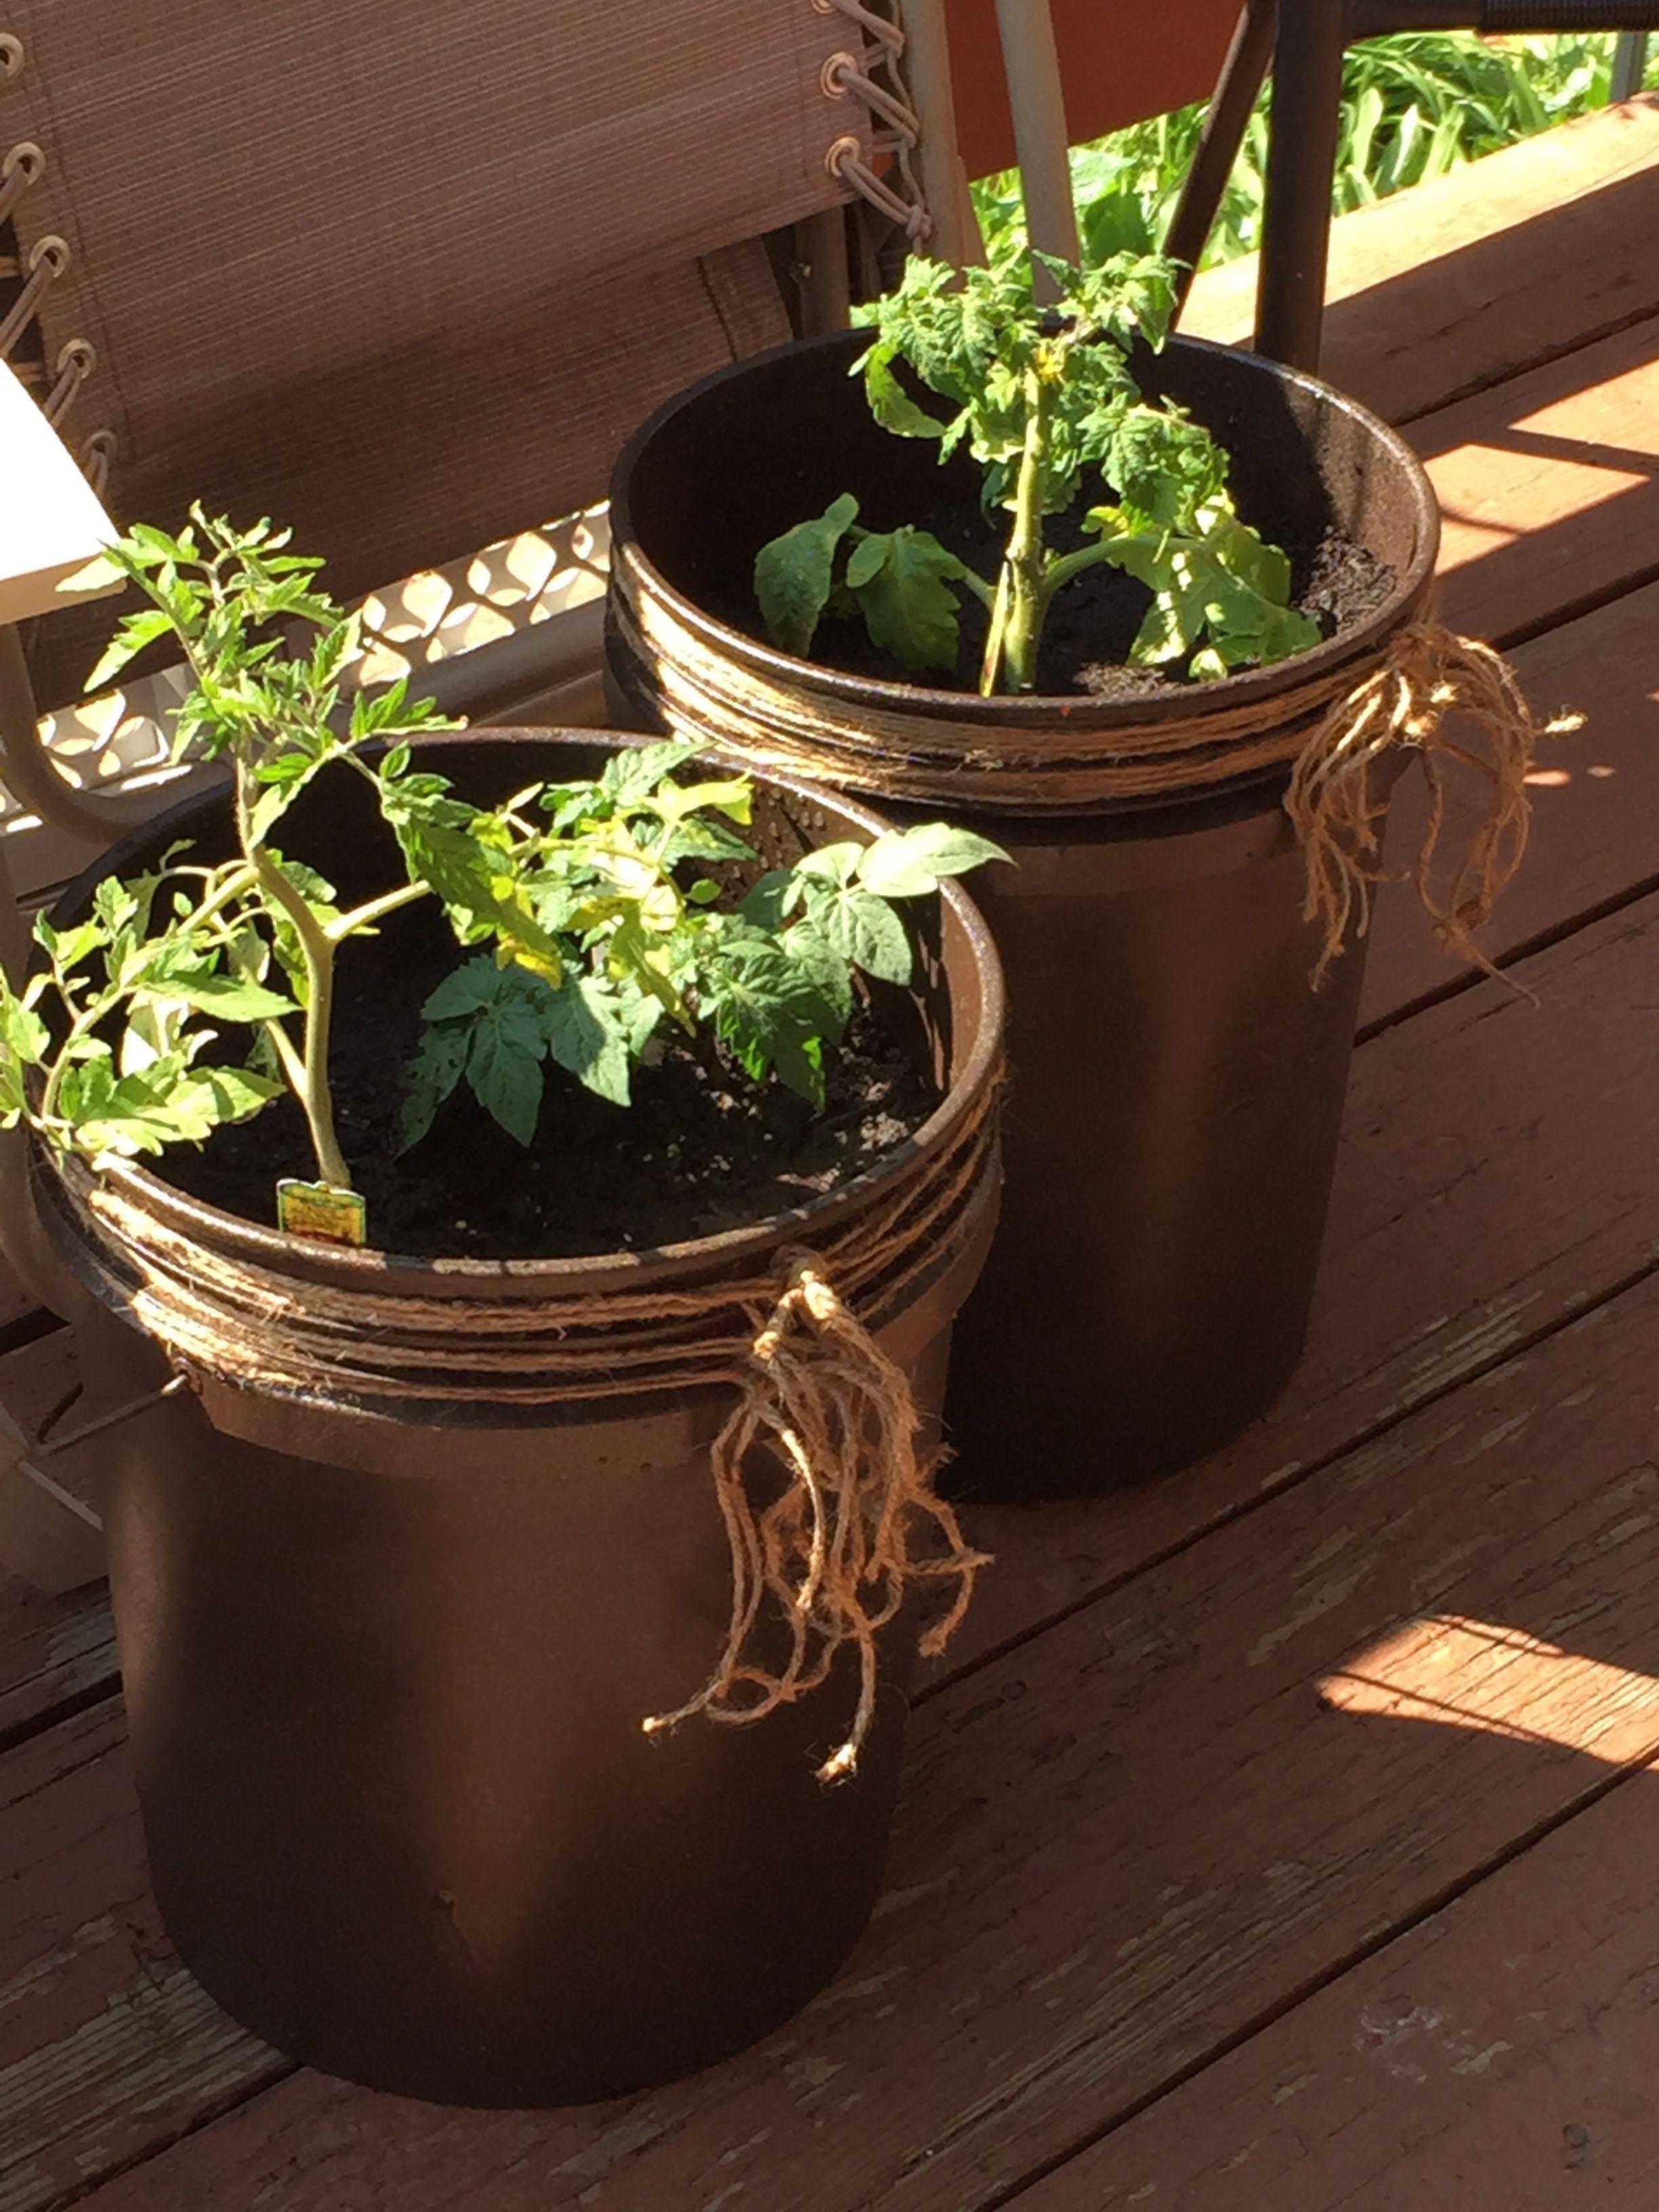 diy 5 gallon bucket patio container tomato planter spray a 5 gallon bucket and add twine